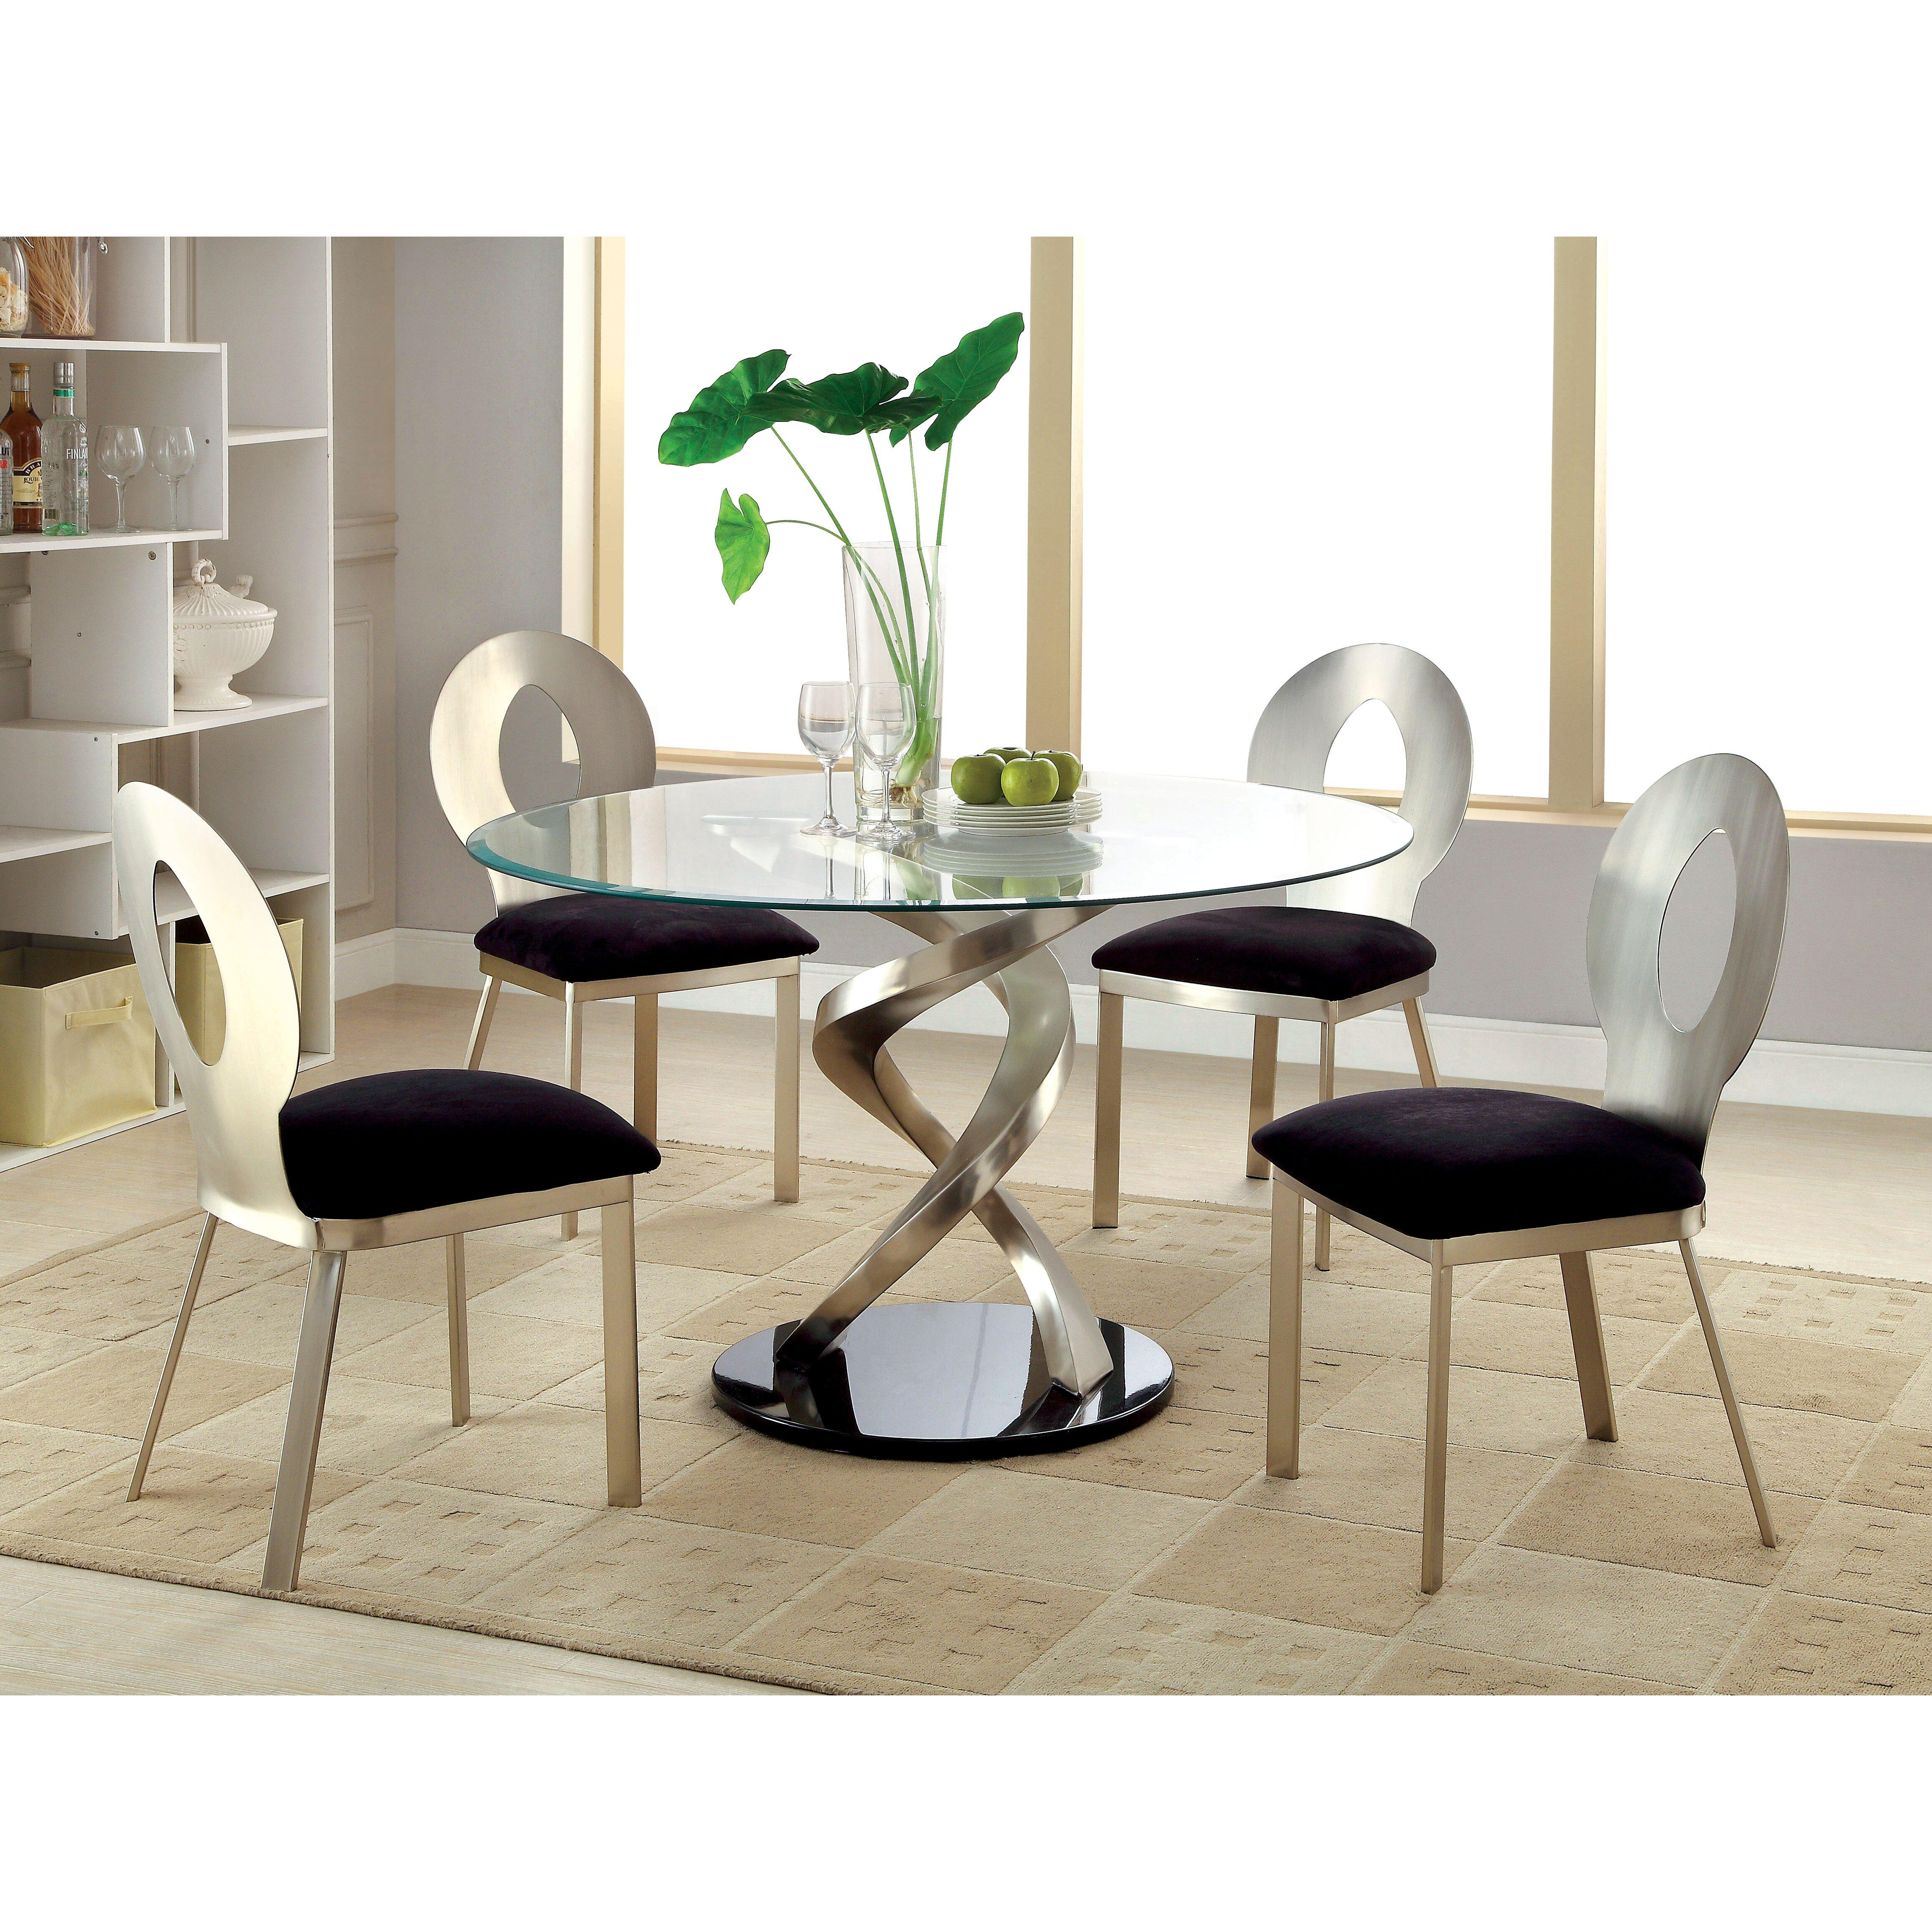 Hokku Designs Cannon Dining Table Wayfair : Hokku Designs Cannon Dining Table from www.wayfair.com size 4630 x 4630 jpeg 3663kB